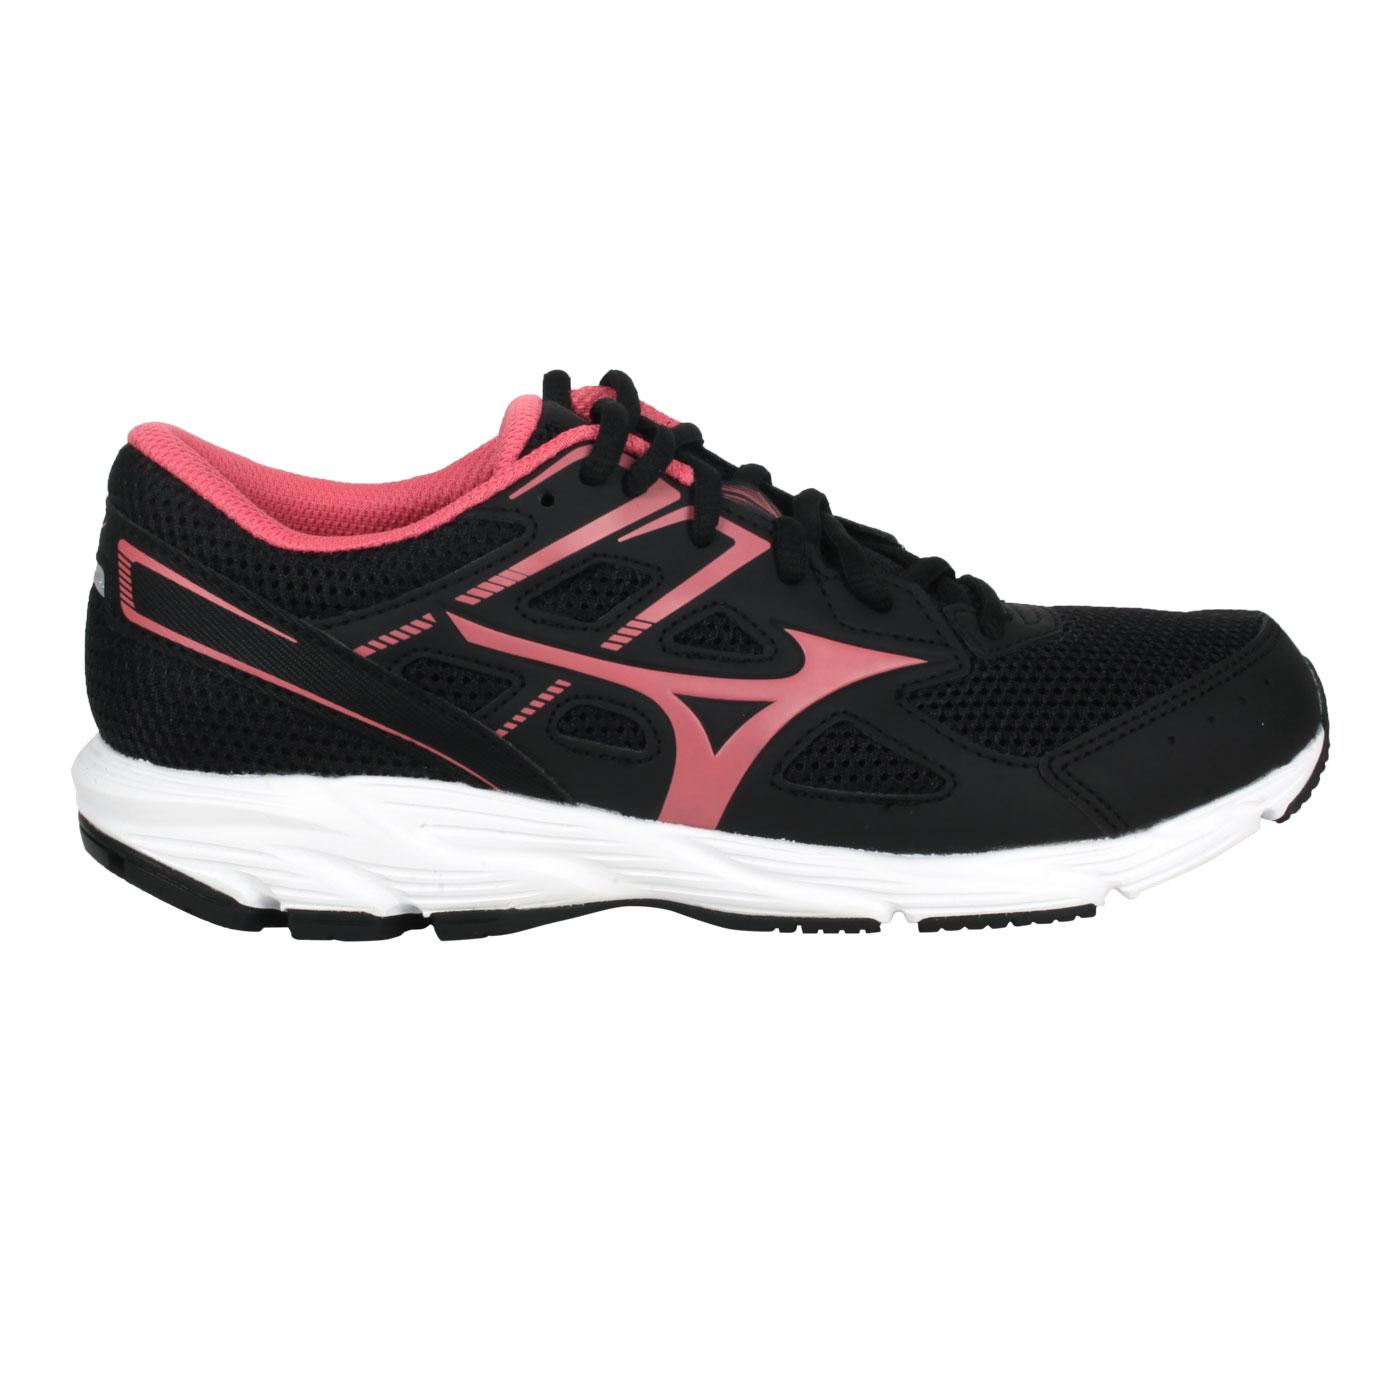 MIZUNO 女款慢跑鞋-WIDE  @MAXIMIZER 23@K1GA210164 - 黑粉